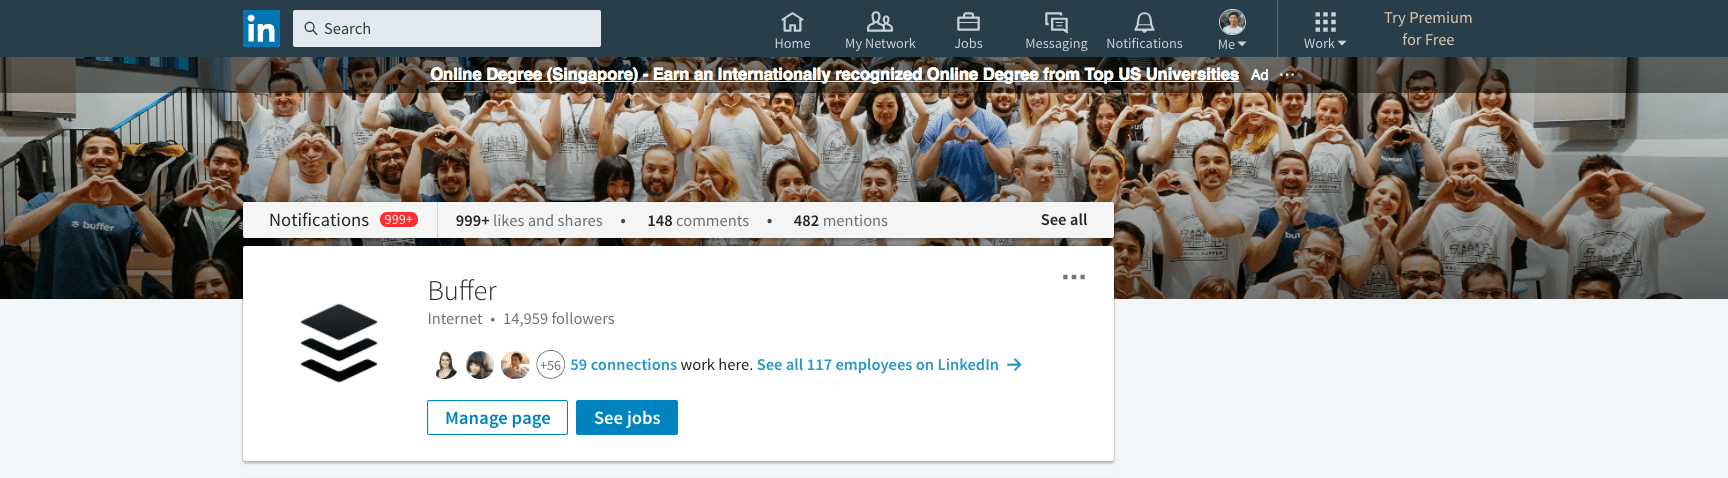 LinkedIn Company Page background photo